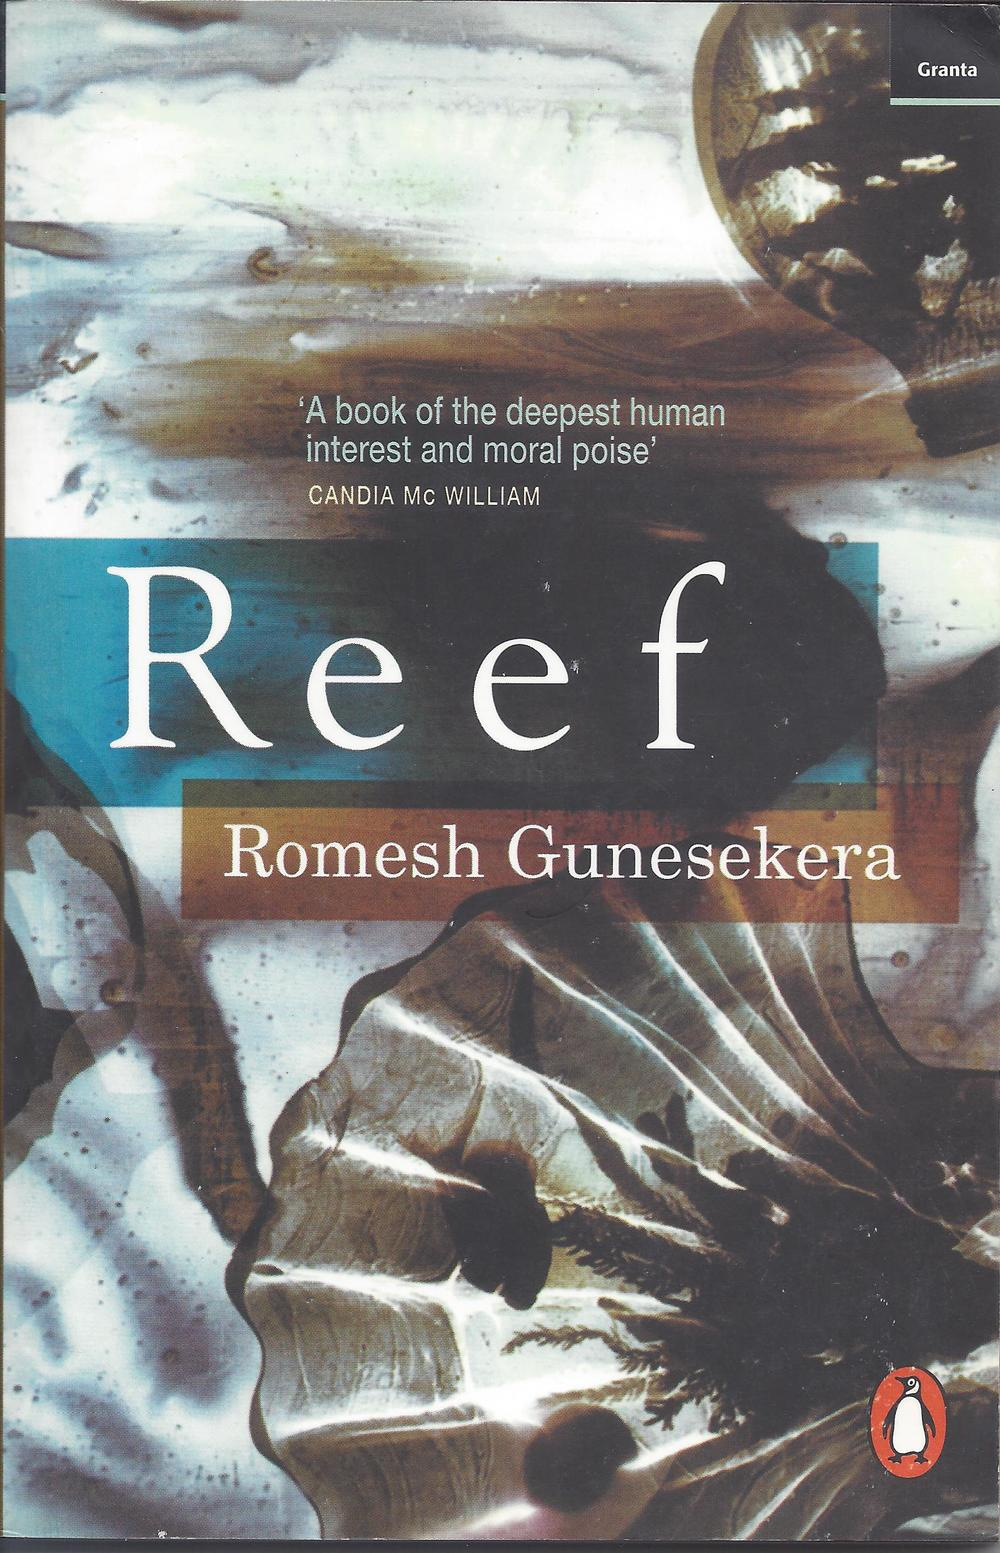 Reef Granta PI pa2.jpg